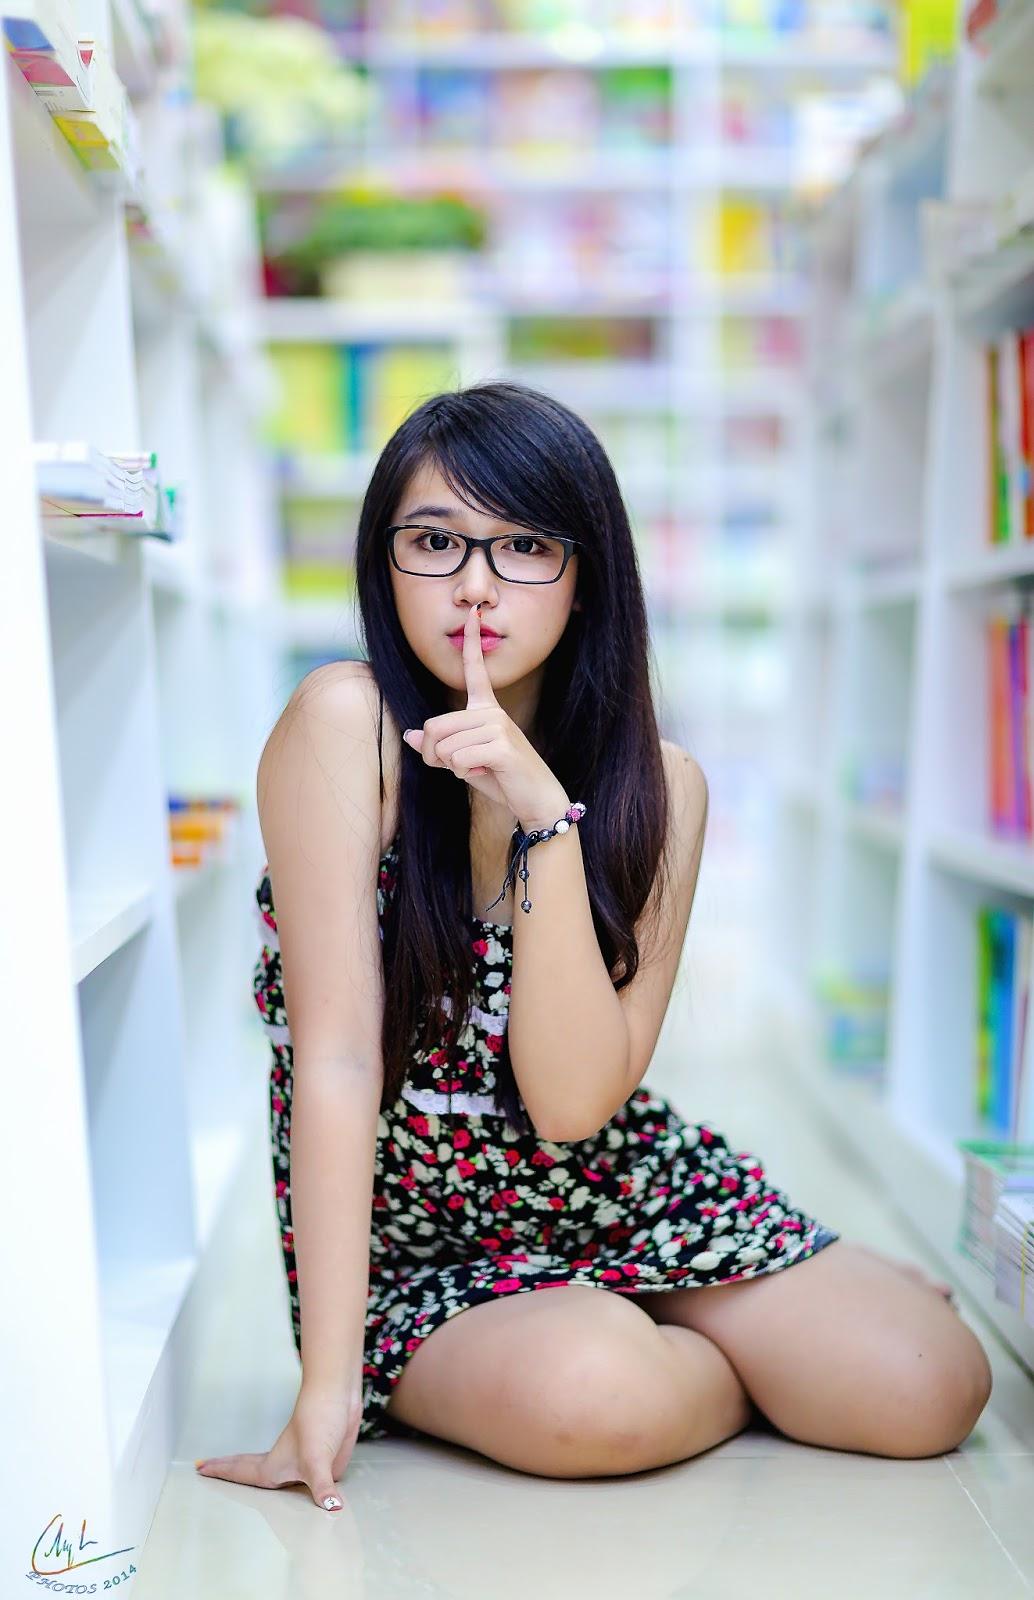 naked-vietnamese-girl-nerd-bbw-renee-ross